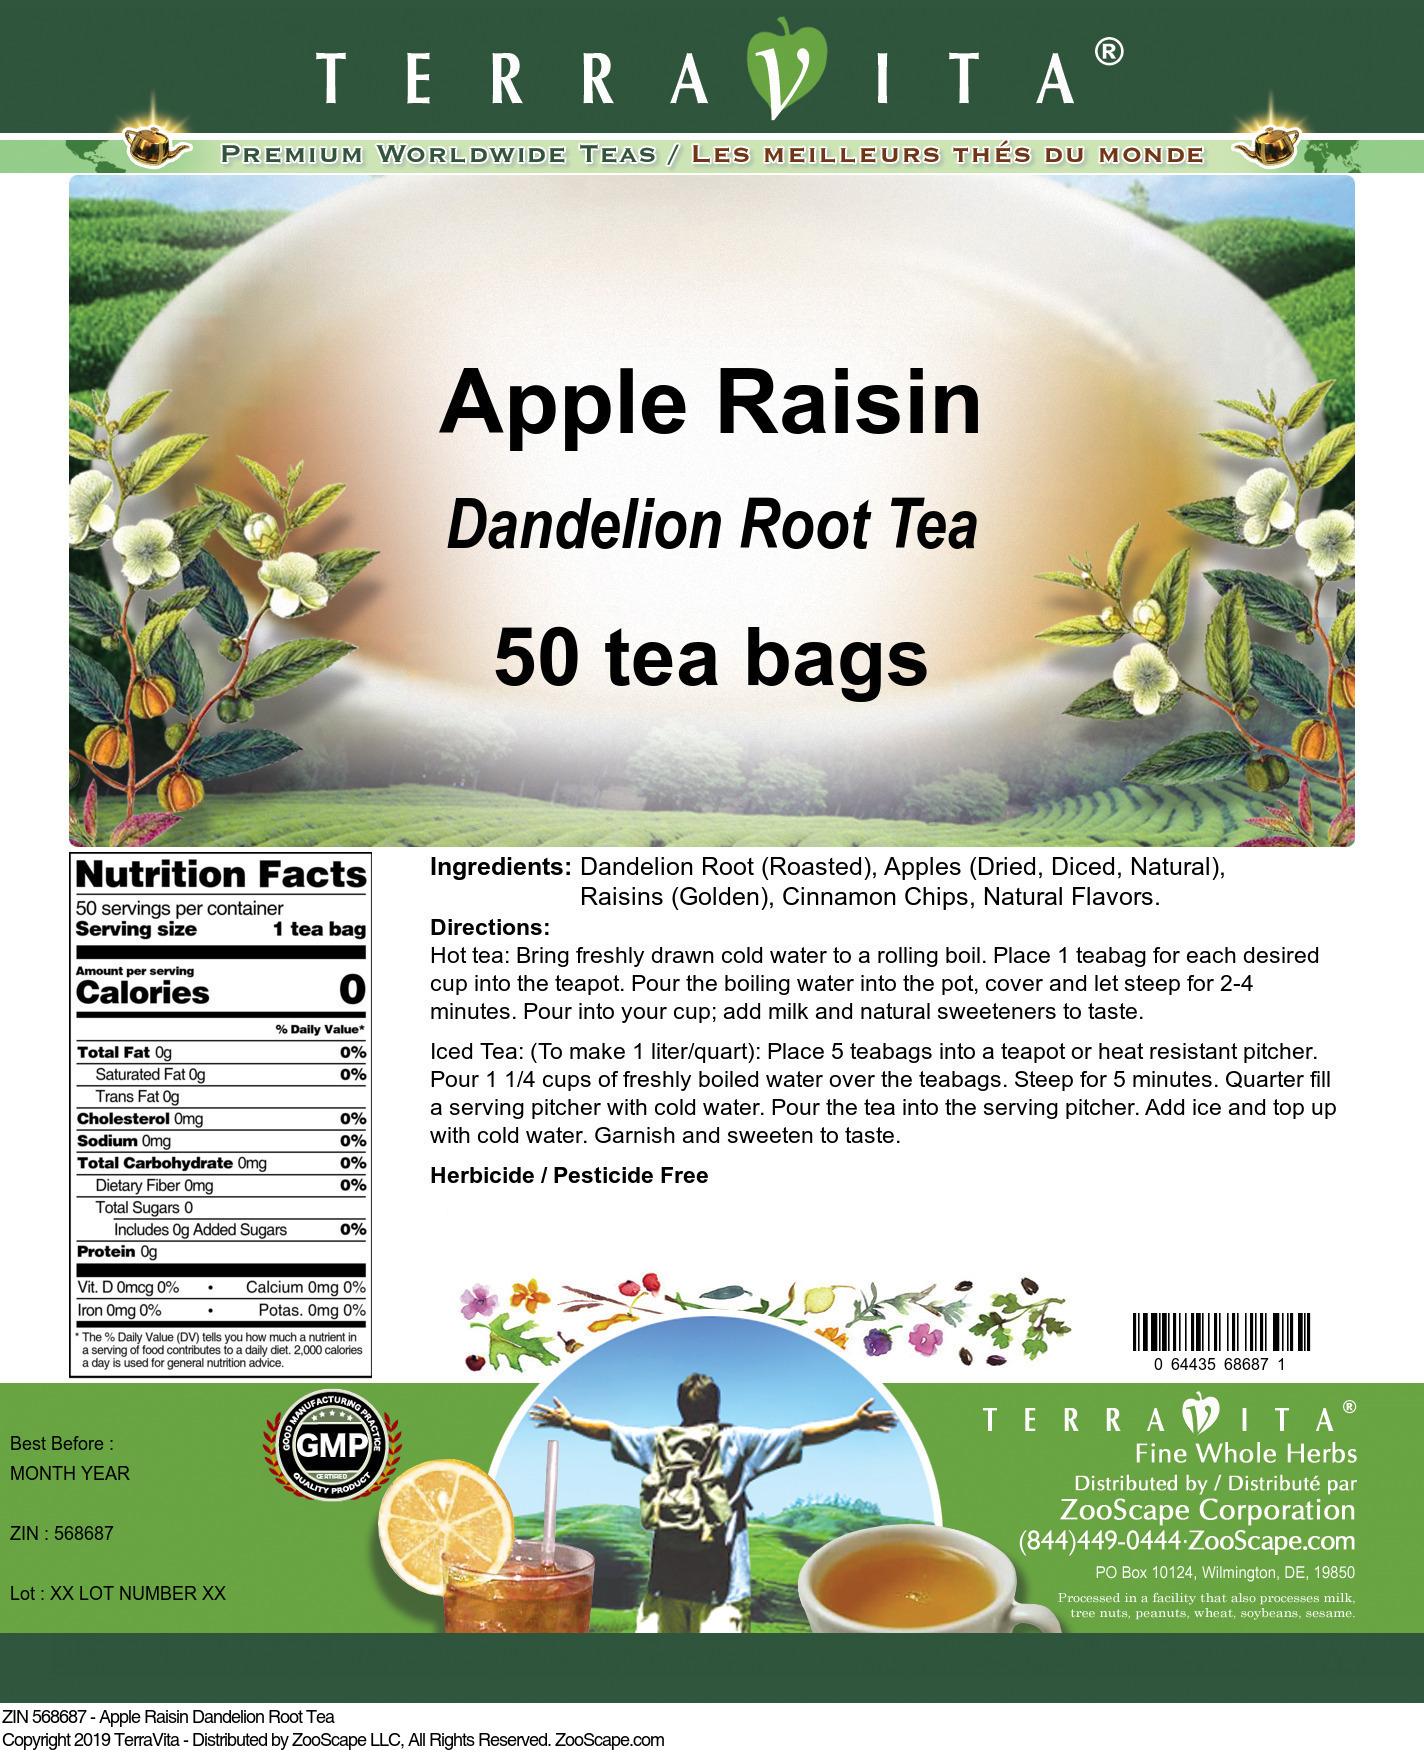 Apple Raisin Dandelion Root